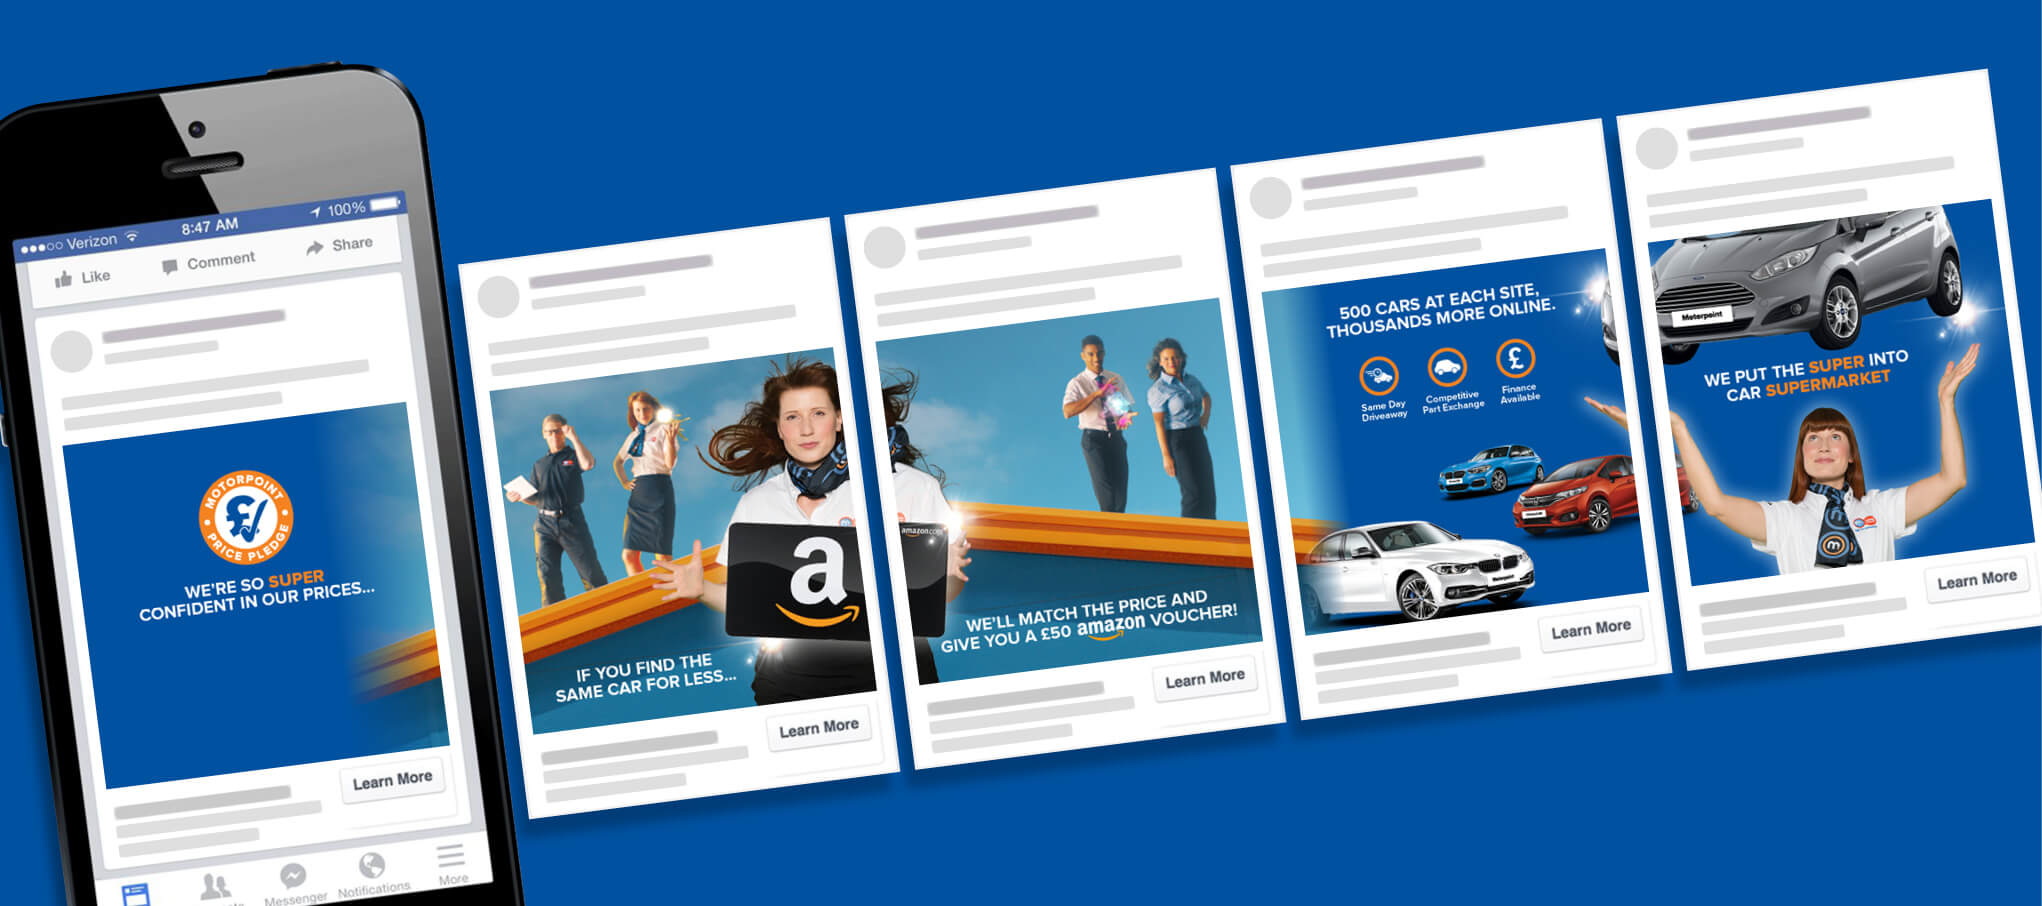 Put the Super into Car Supermarket facebook carousel